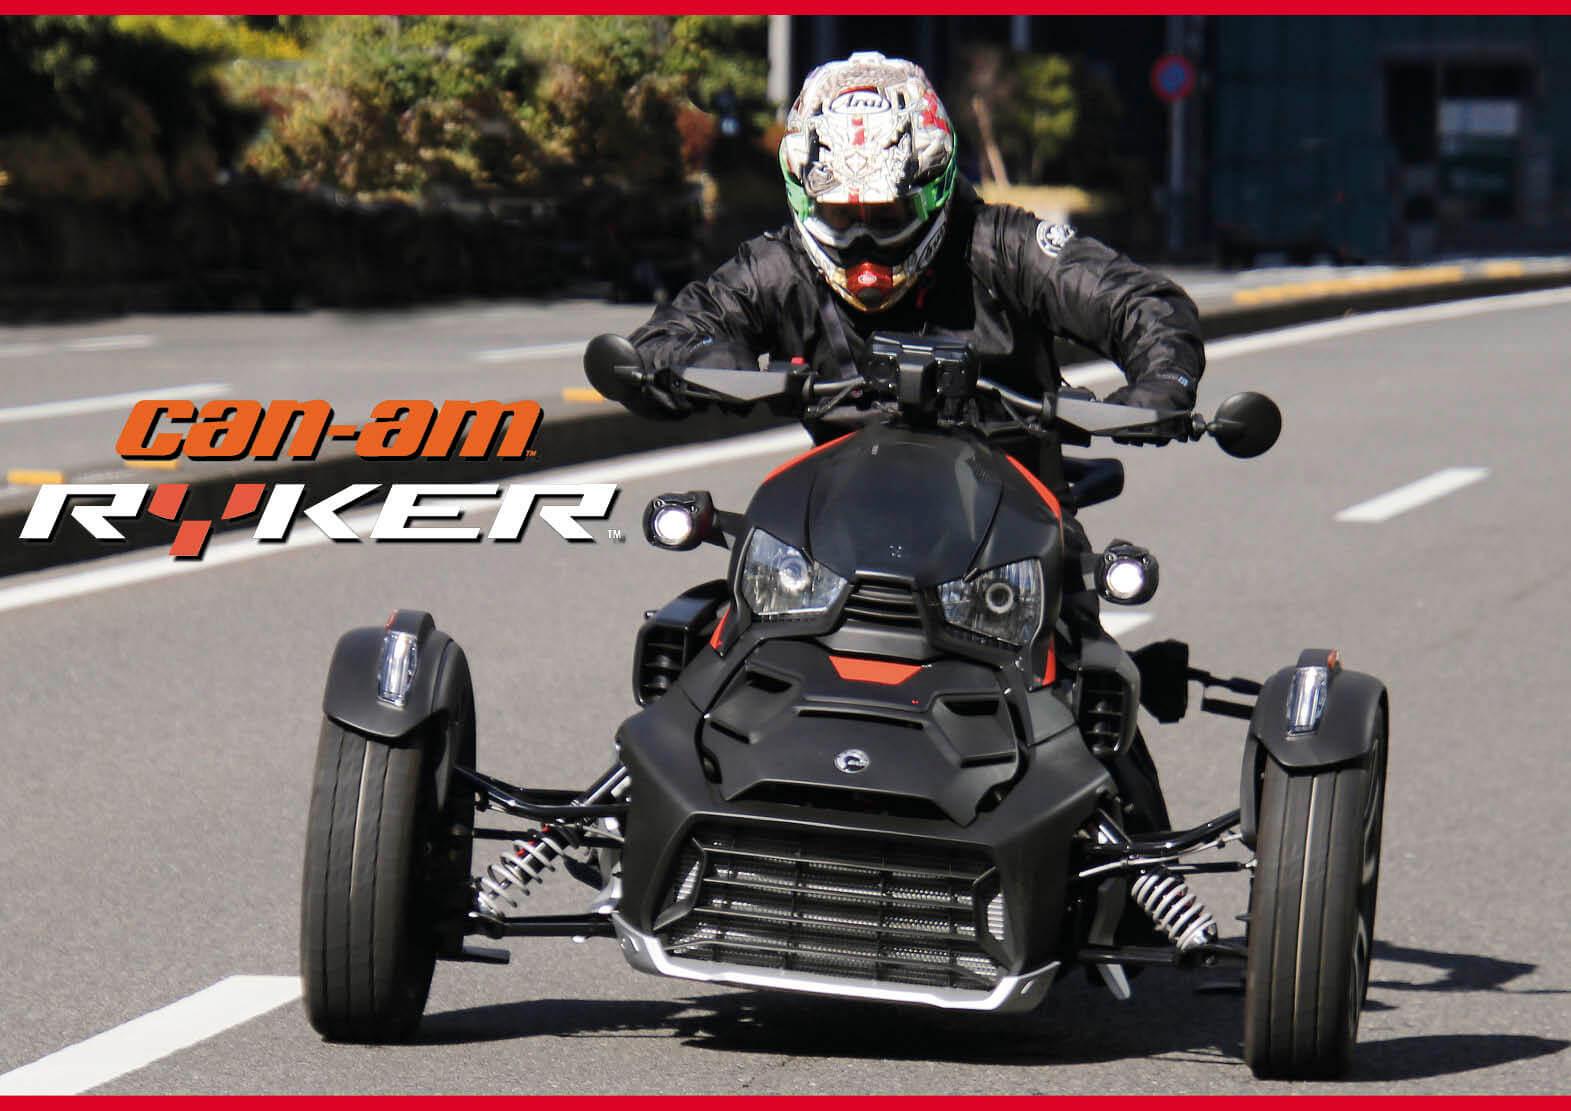 BRP Can-Am Ryker(カンナム ライカー) シンプル イズ ベスト! ちょい乗りするにも最高な自慢の相棒、こんなにワイルド! ジェットスキー(水上バイク)